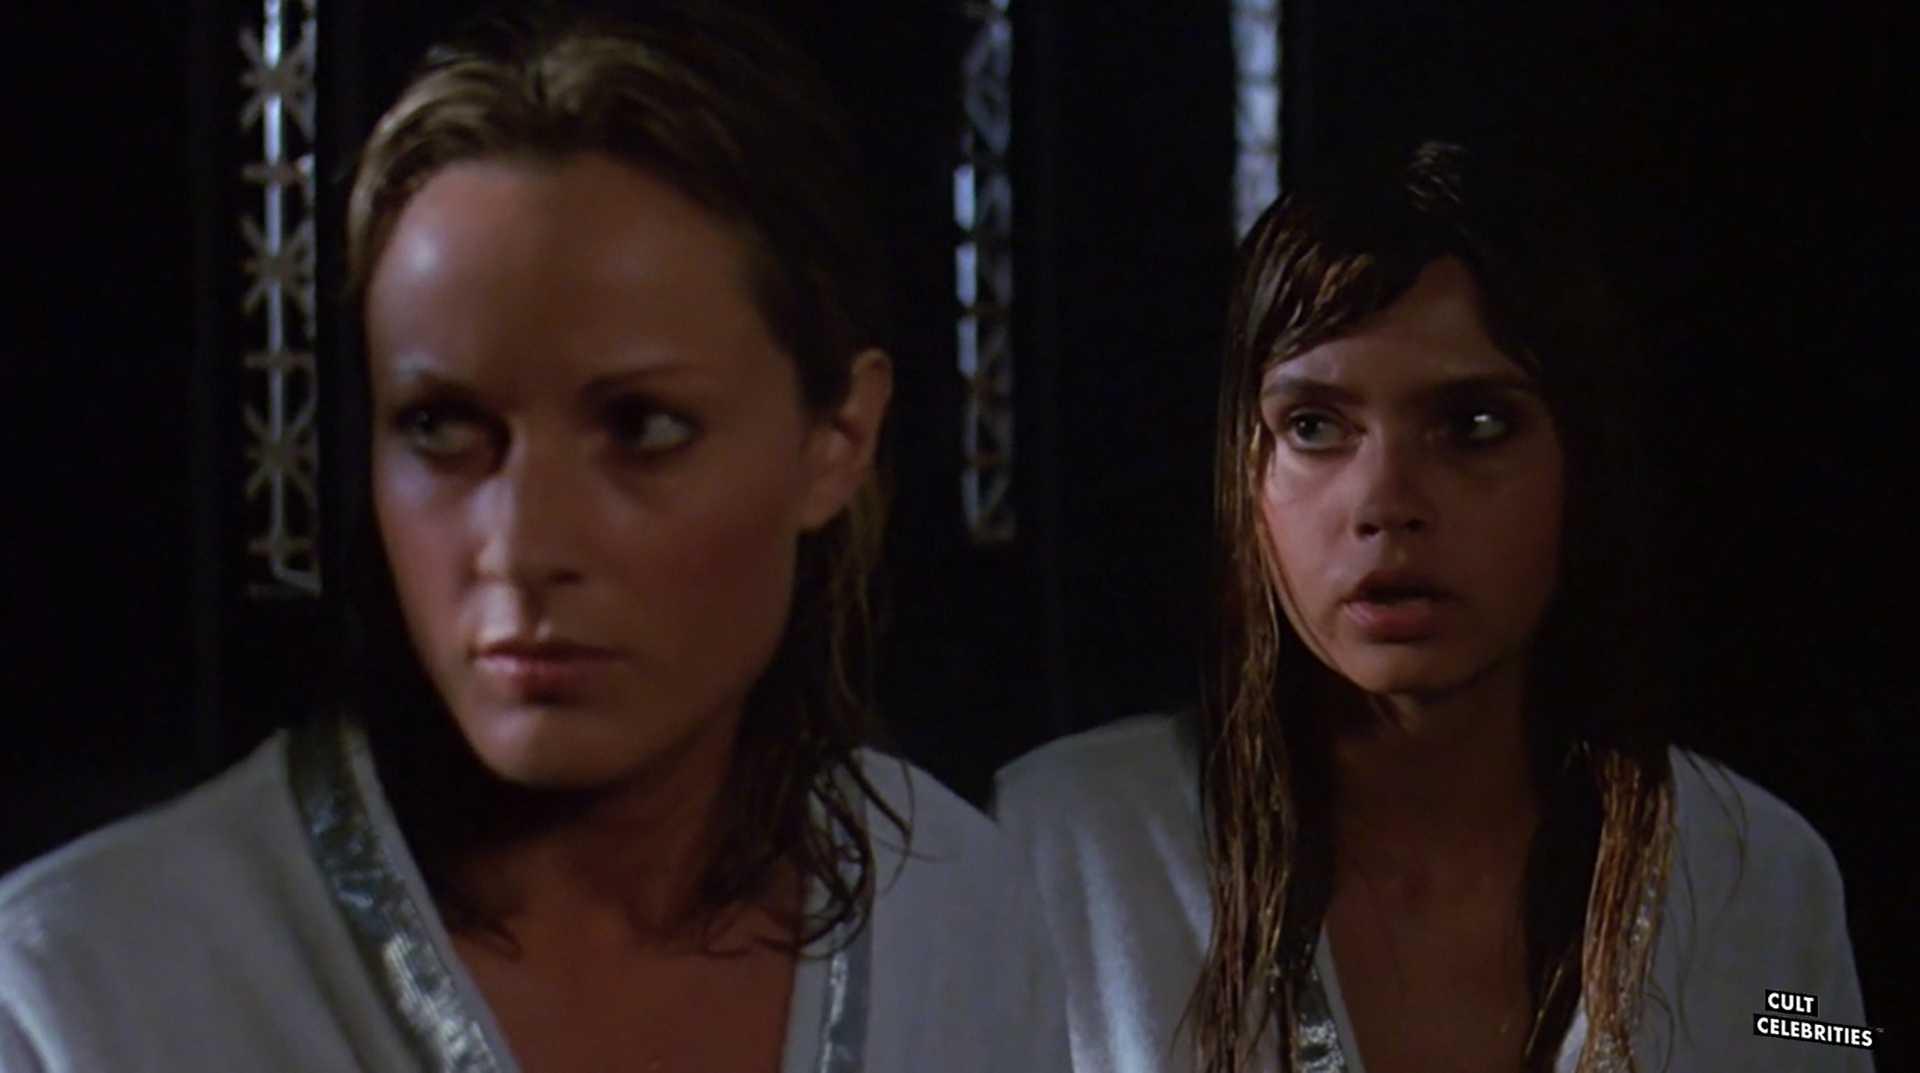 June Chadwick and Dawn Dunlap in Forbidden World (1982)